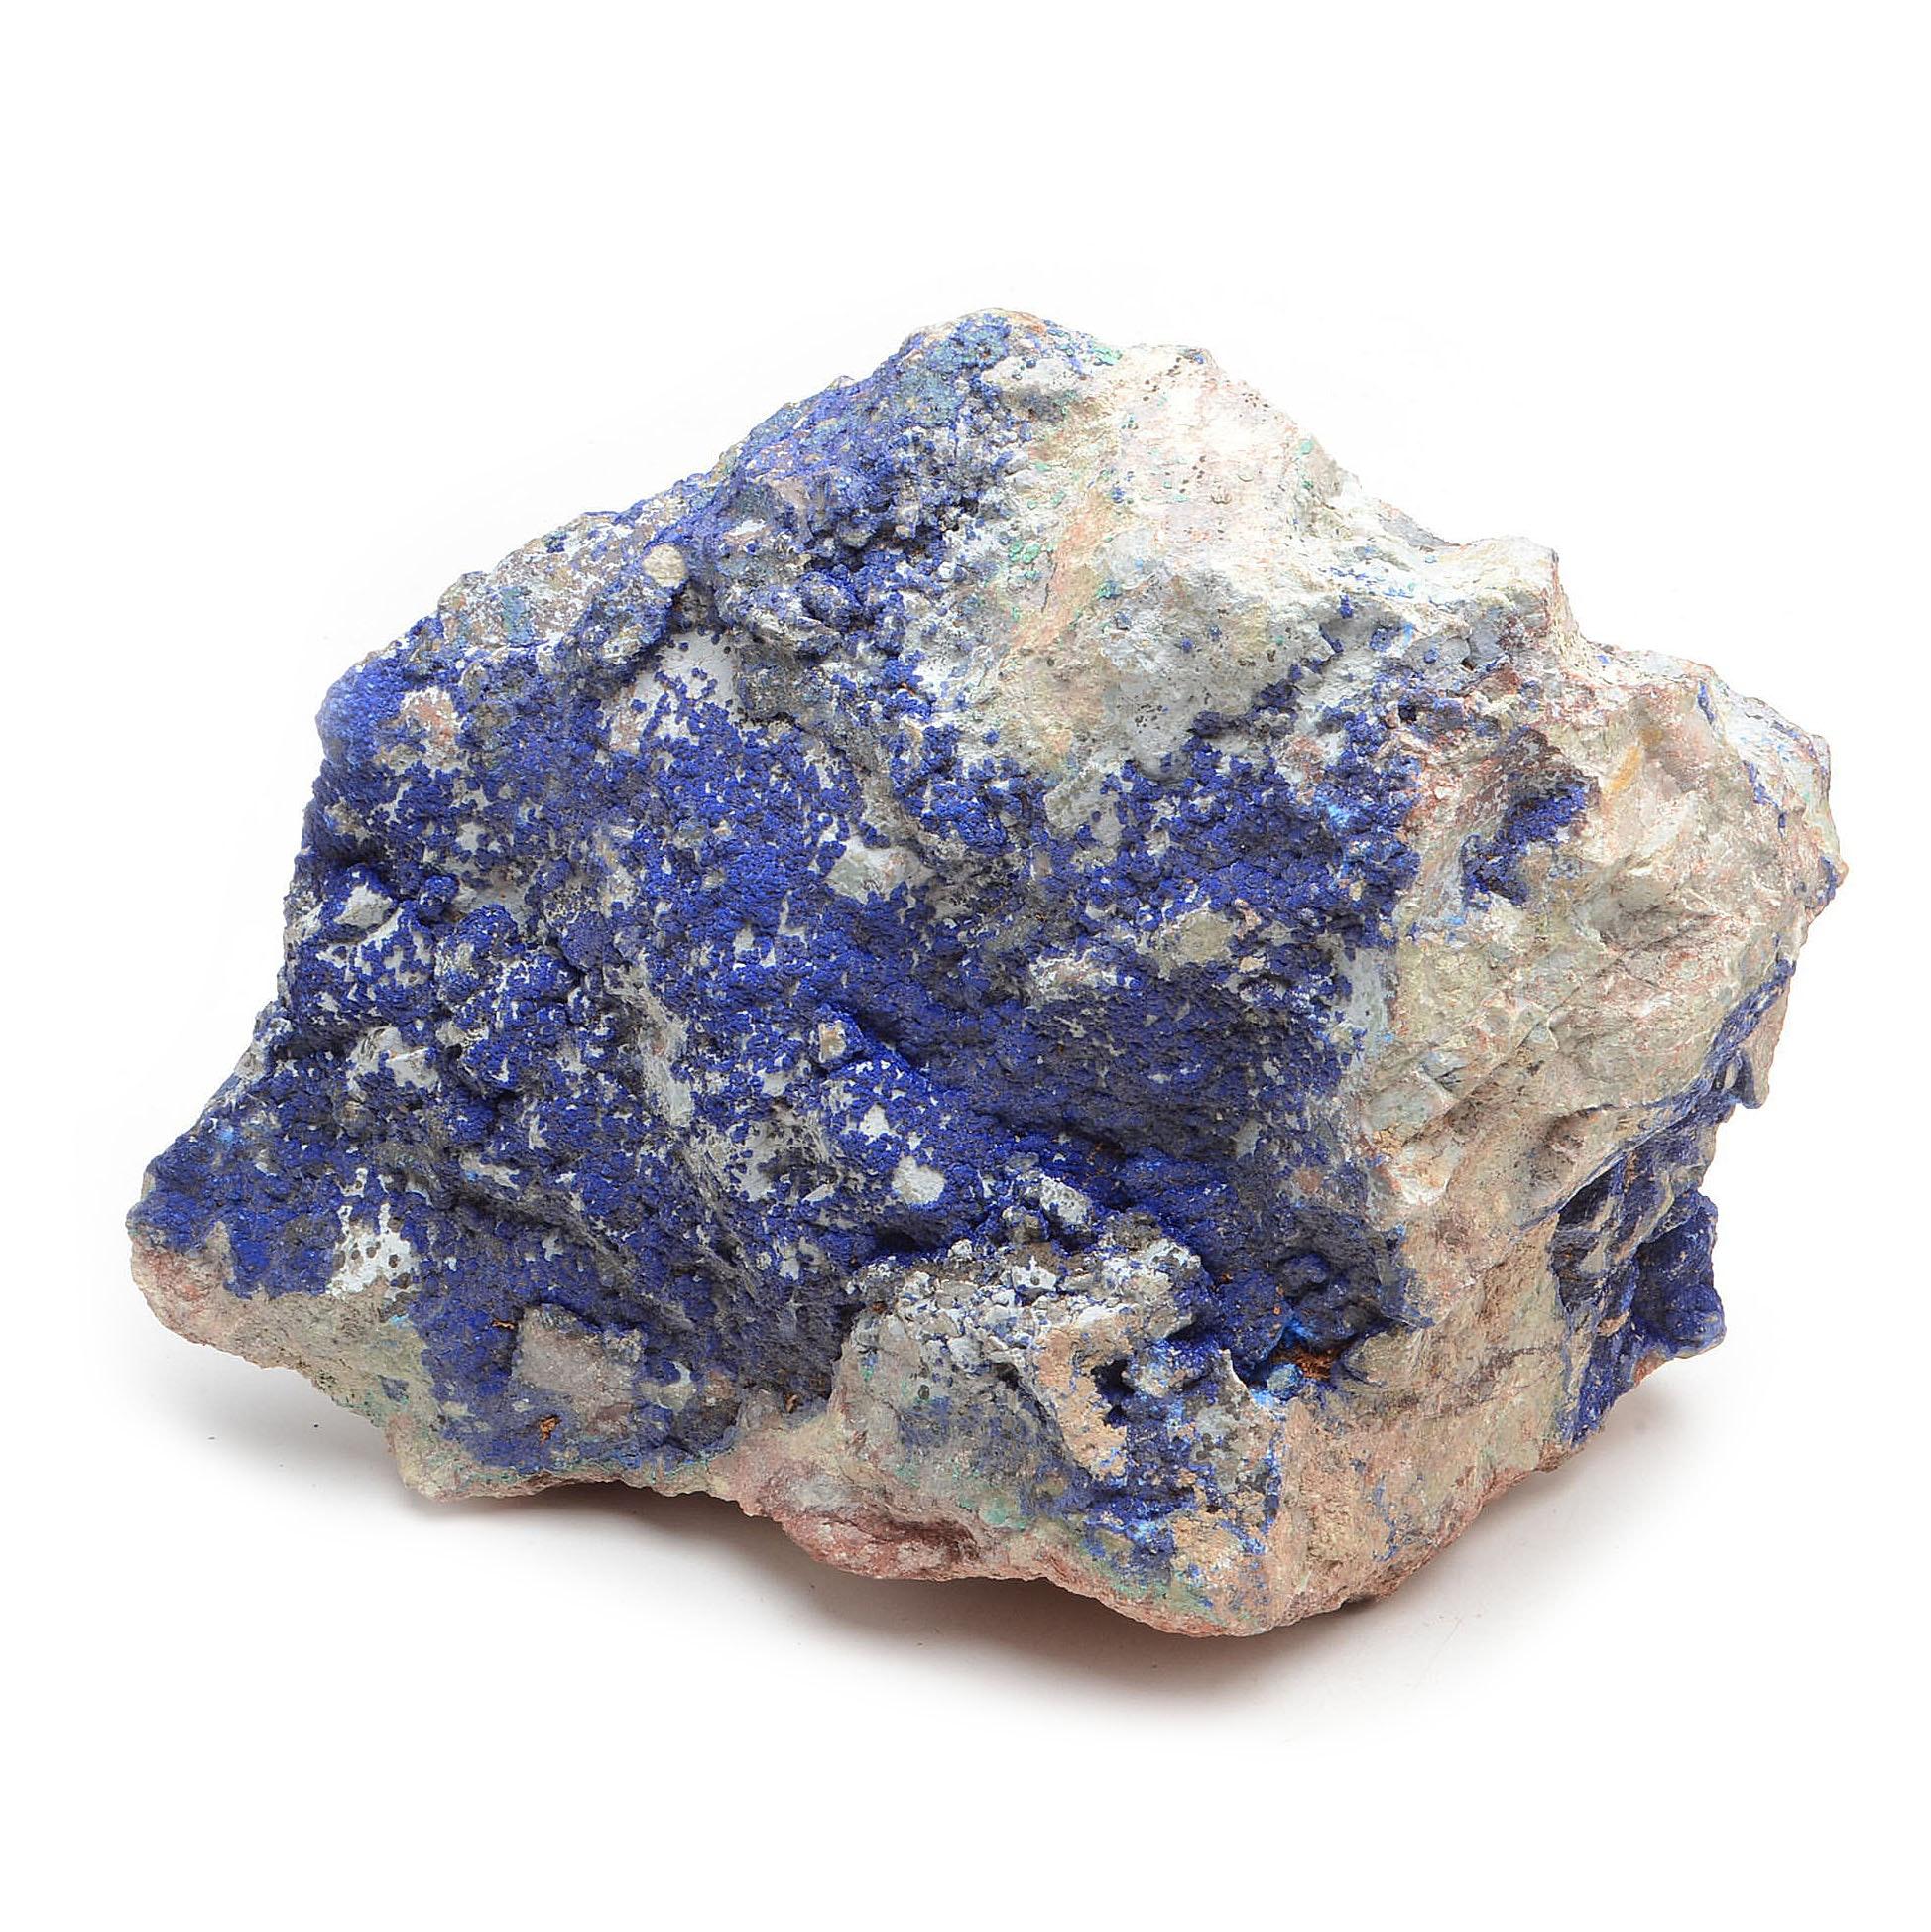 Cabinet Display Mineral Specimen of Azurite